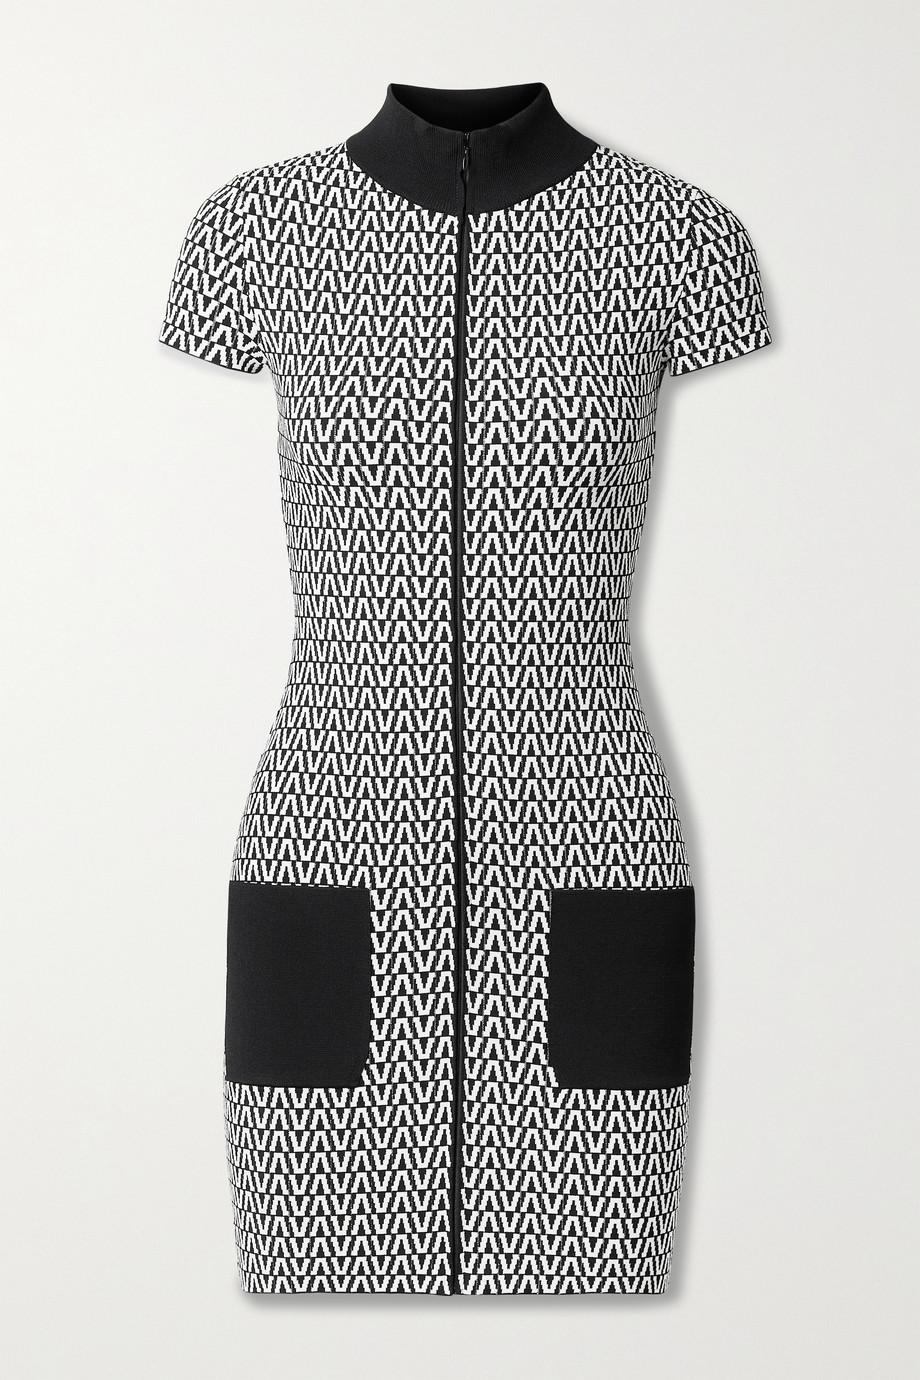 Valentino Mini-robe en mailles jacquard